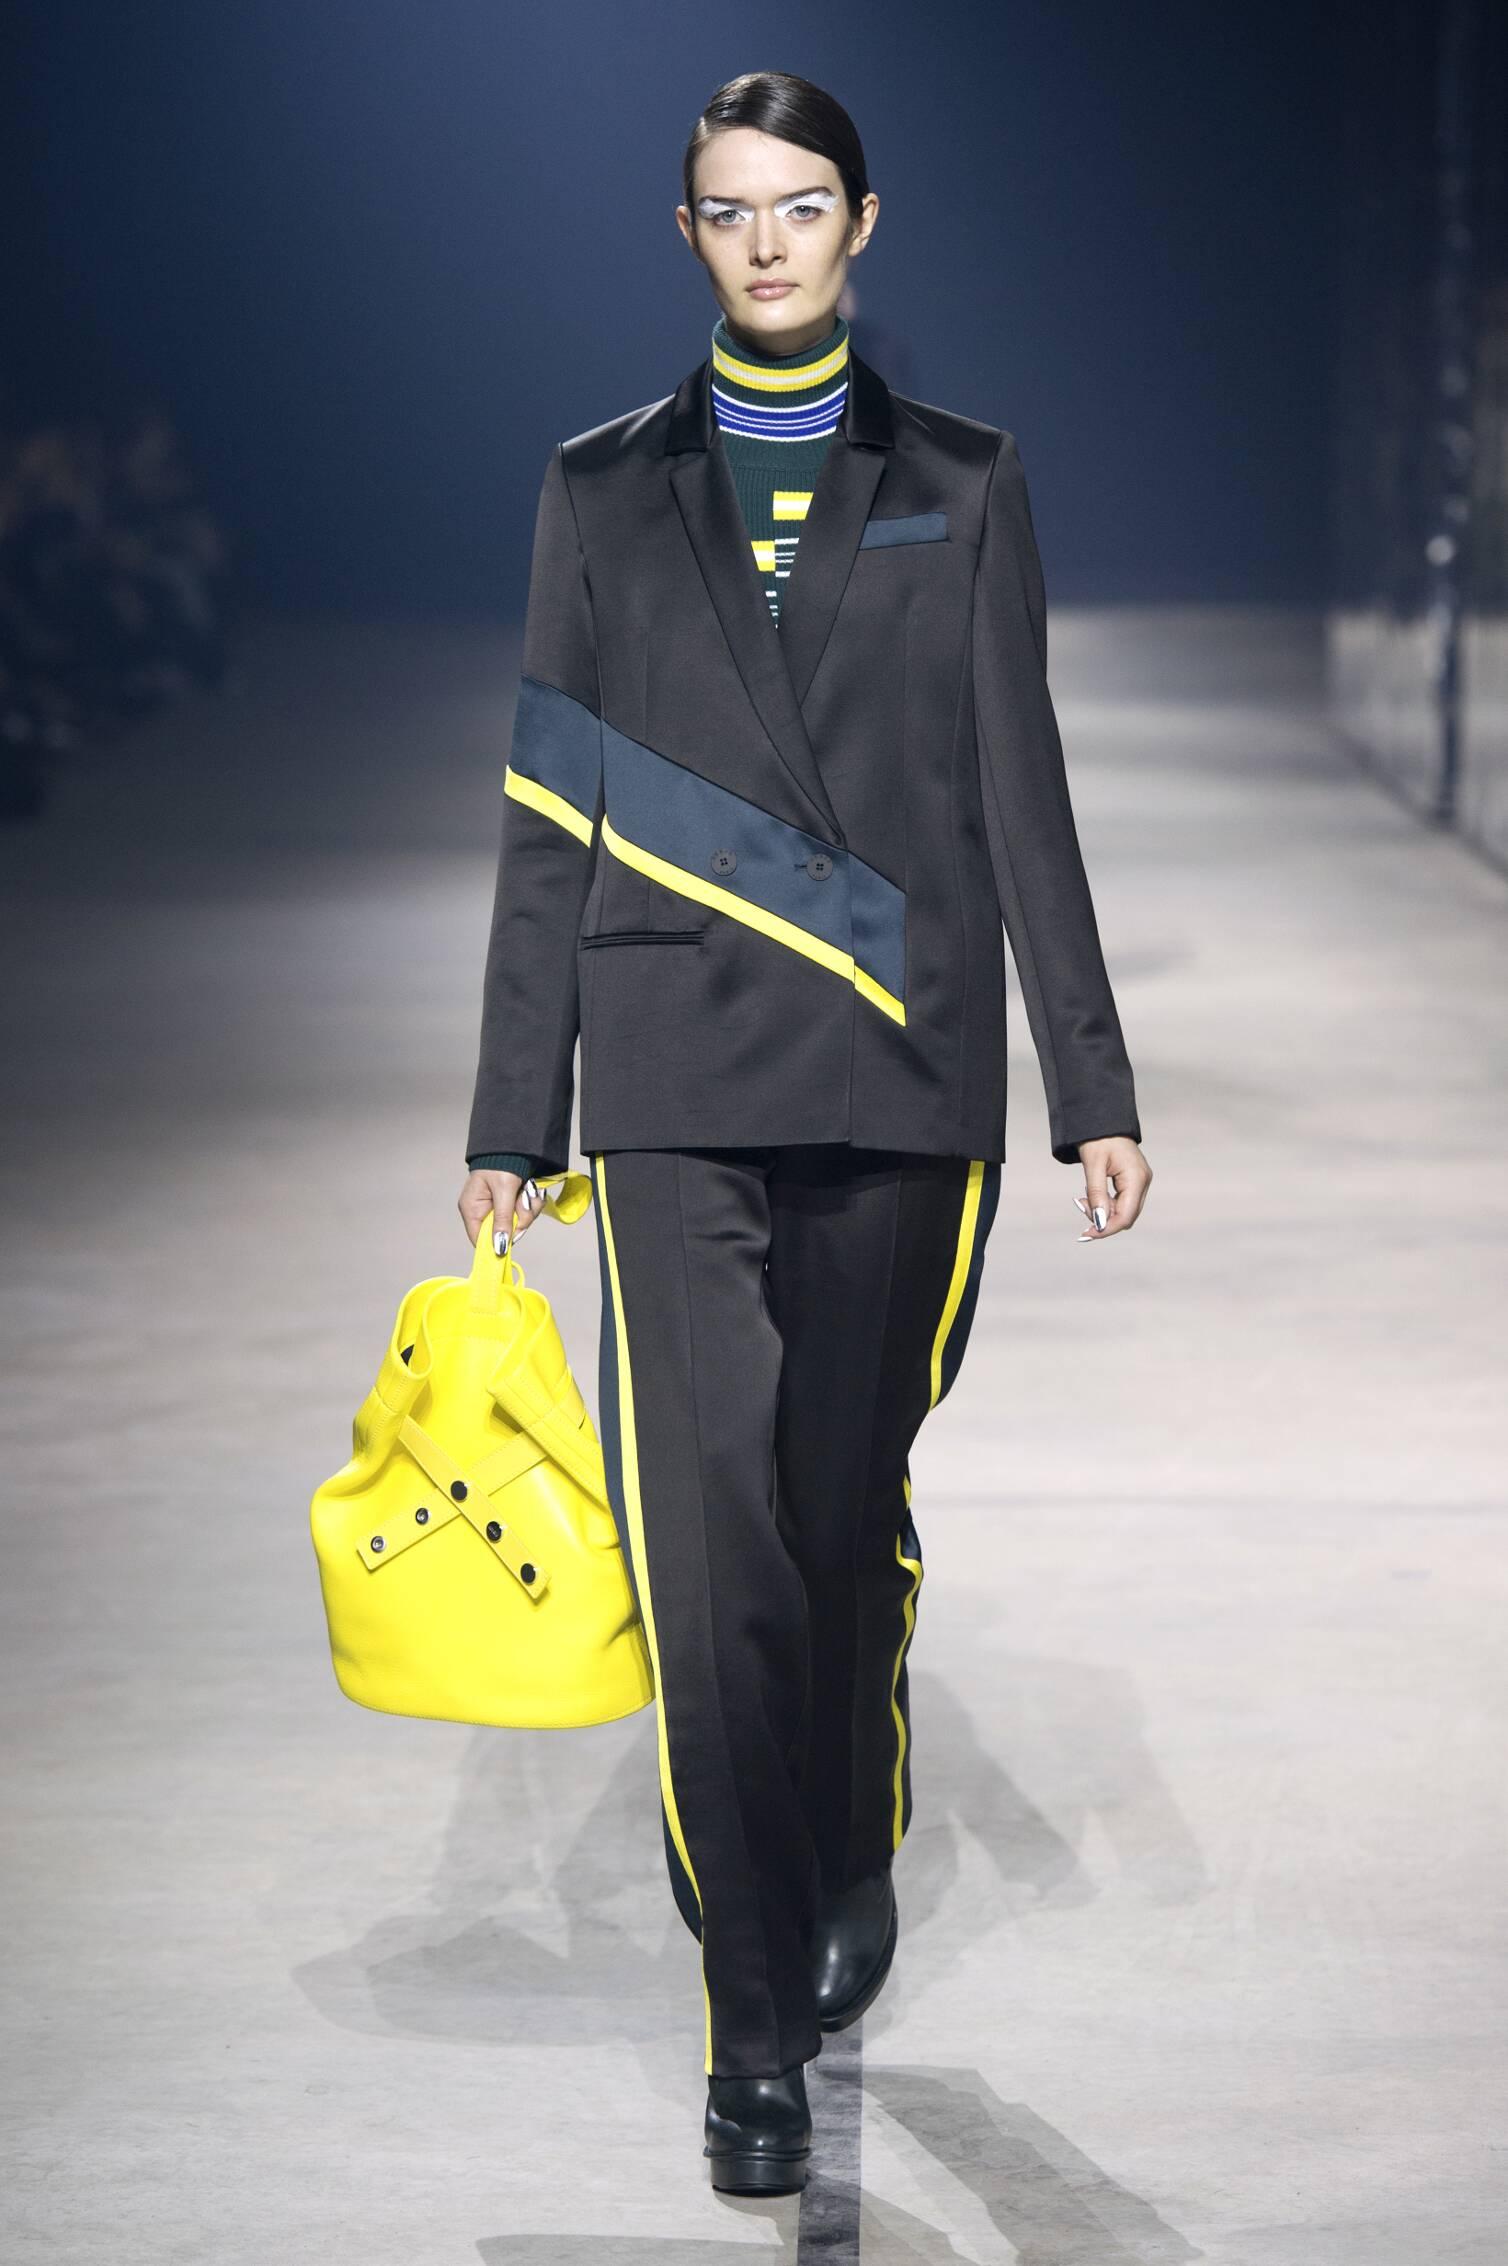 Kenzo Fall Winter 2015 16 Womenswear Collection Paris Fashion Week Fashion Show